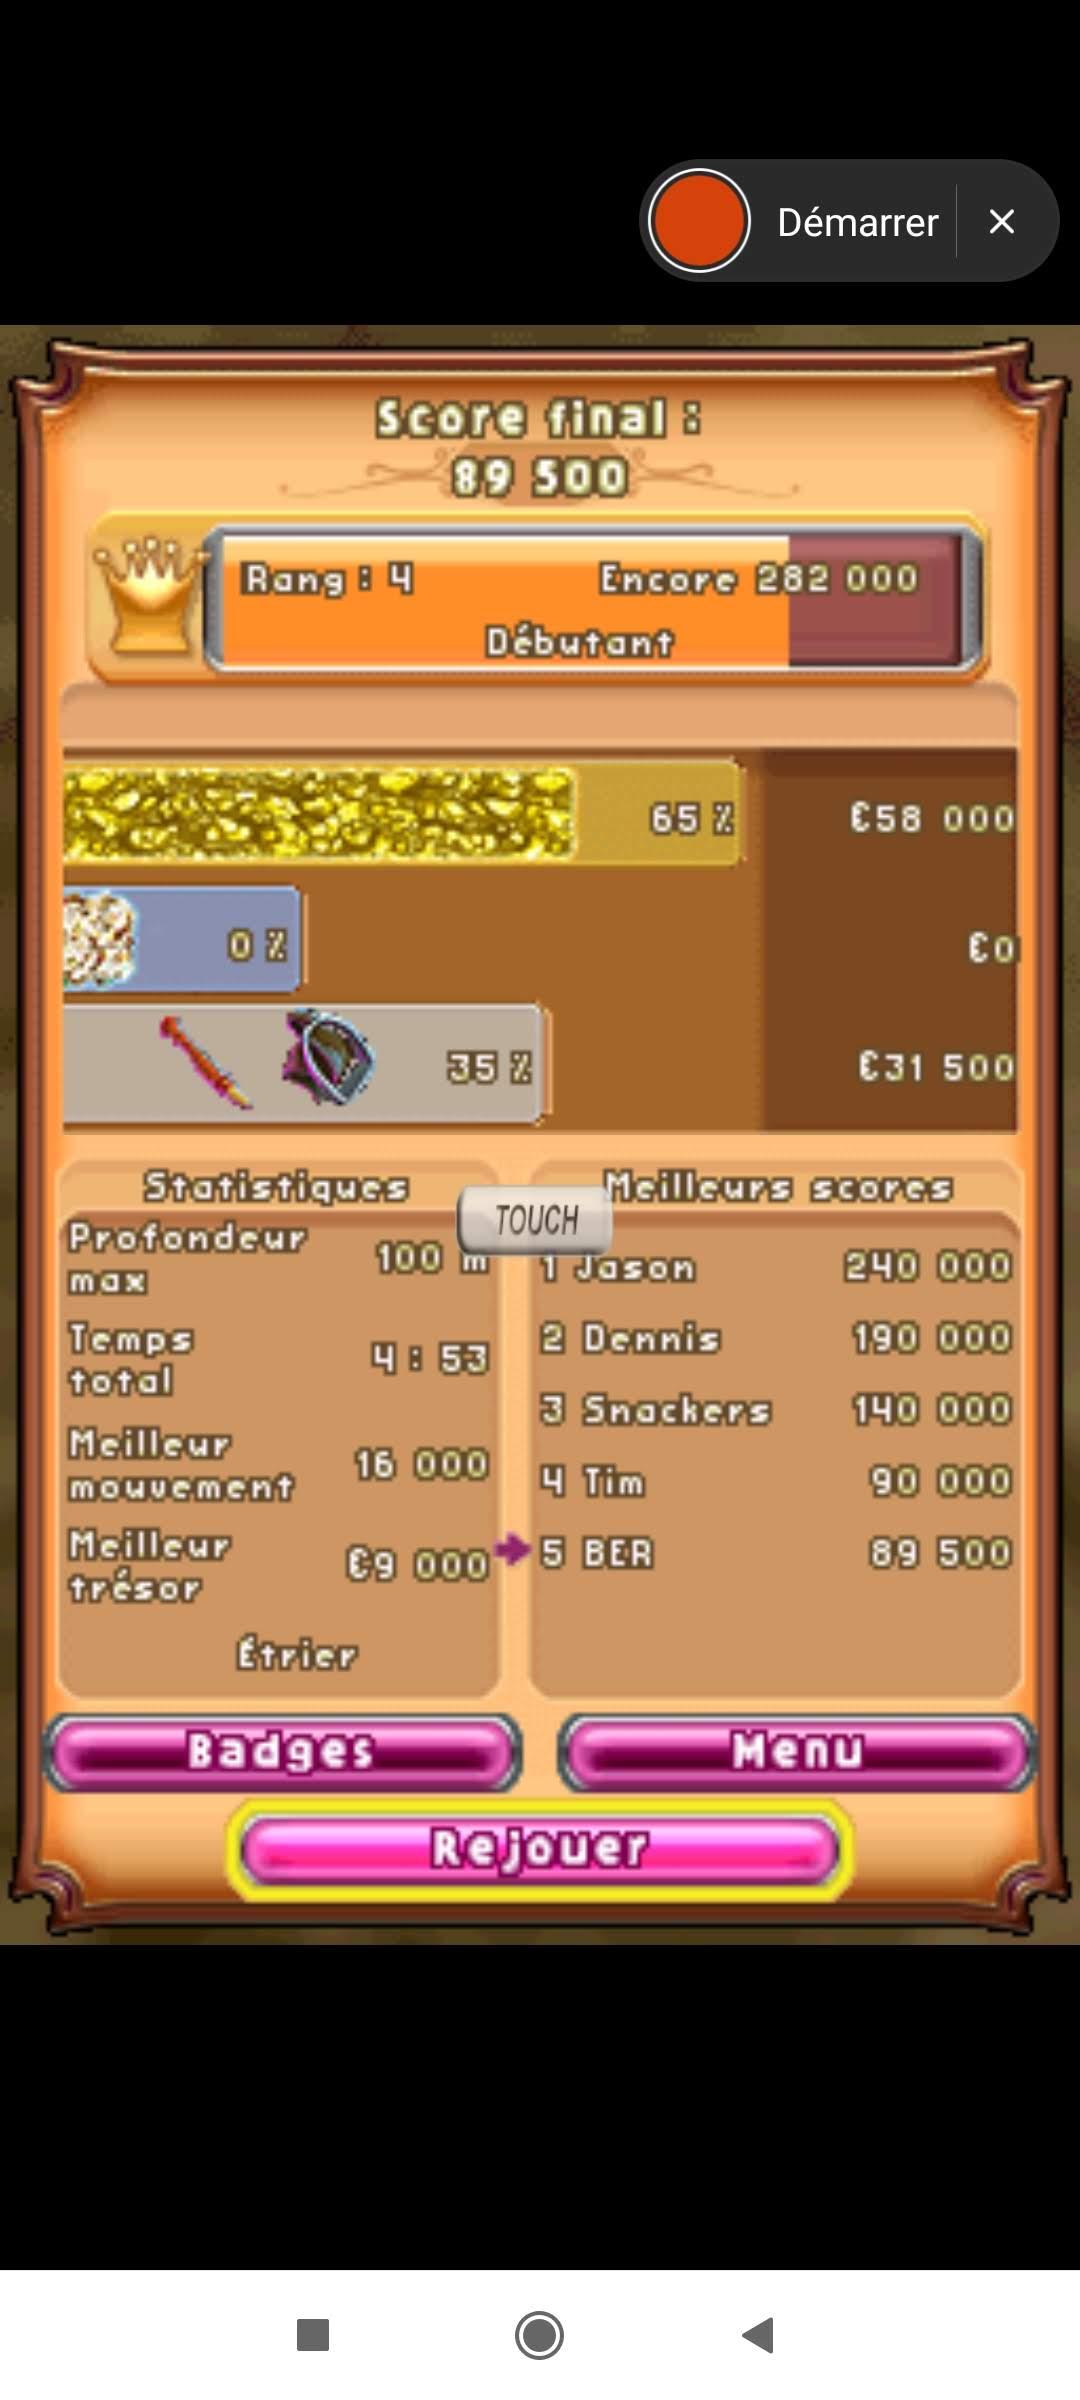 Larquey: Bejeweled 3: Diamond Mine [Diamonds Collected] (Nintendo DS Emulated) 0 points on 2020-09-27 12:33:08